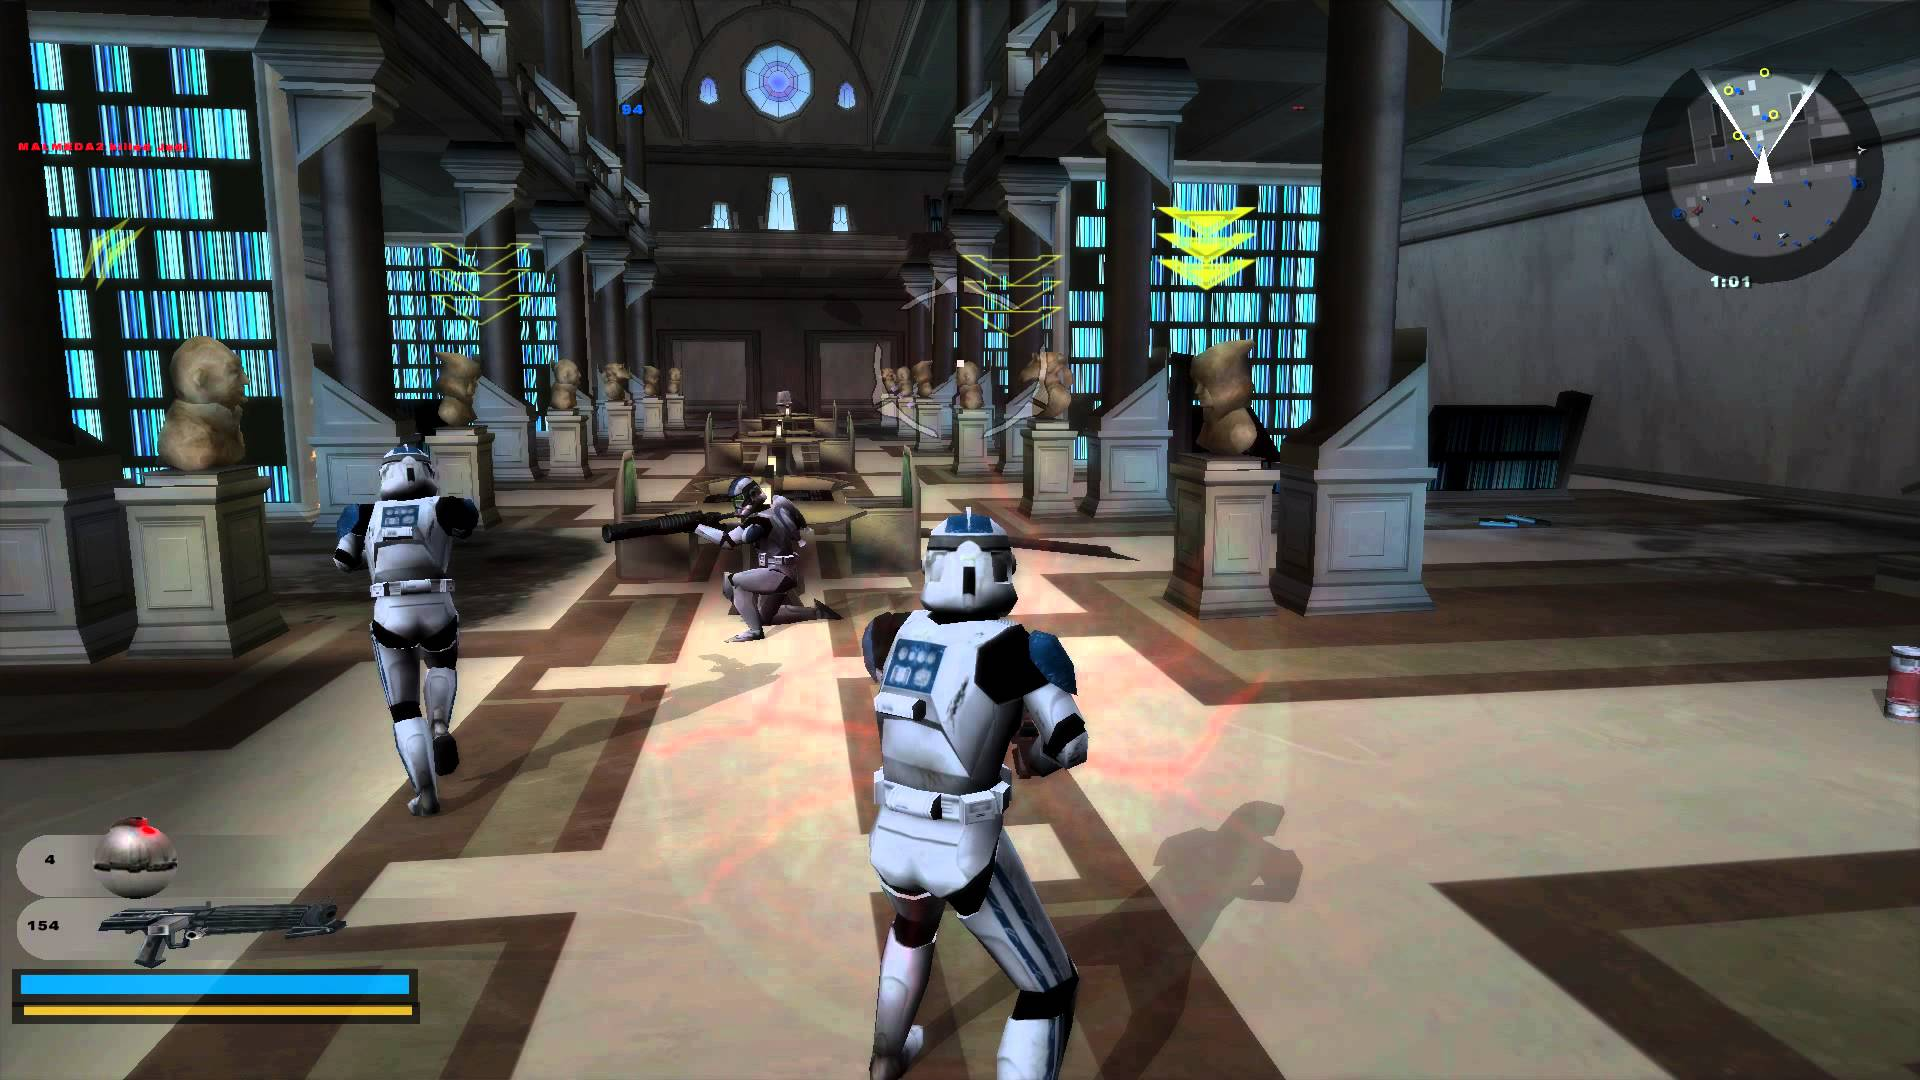 Star Wars Battlefront Ii Wallpapers Video Game Hq Star Wars Battlefront Ii Pictures 4k Wallpapers 2019